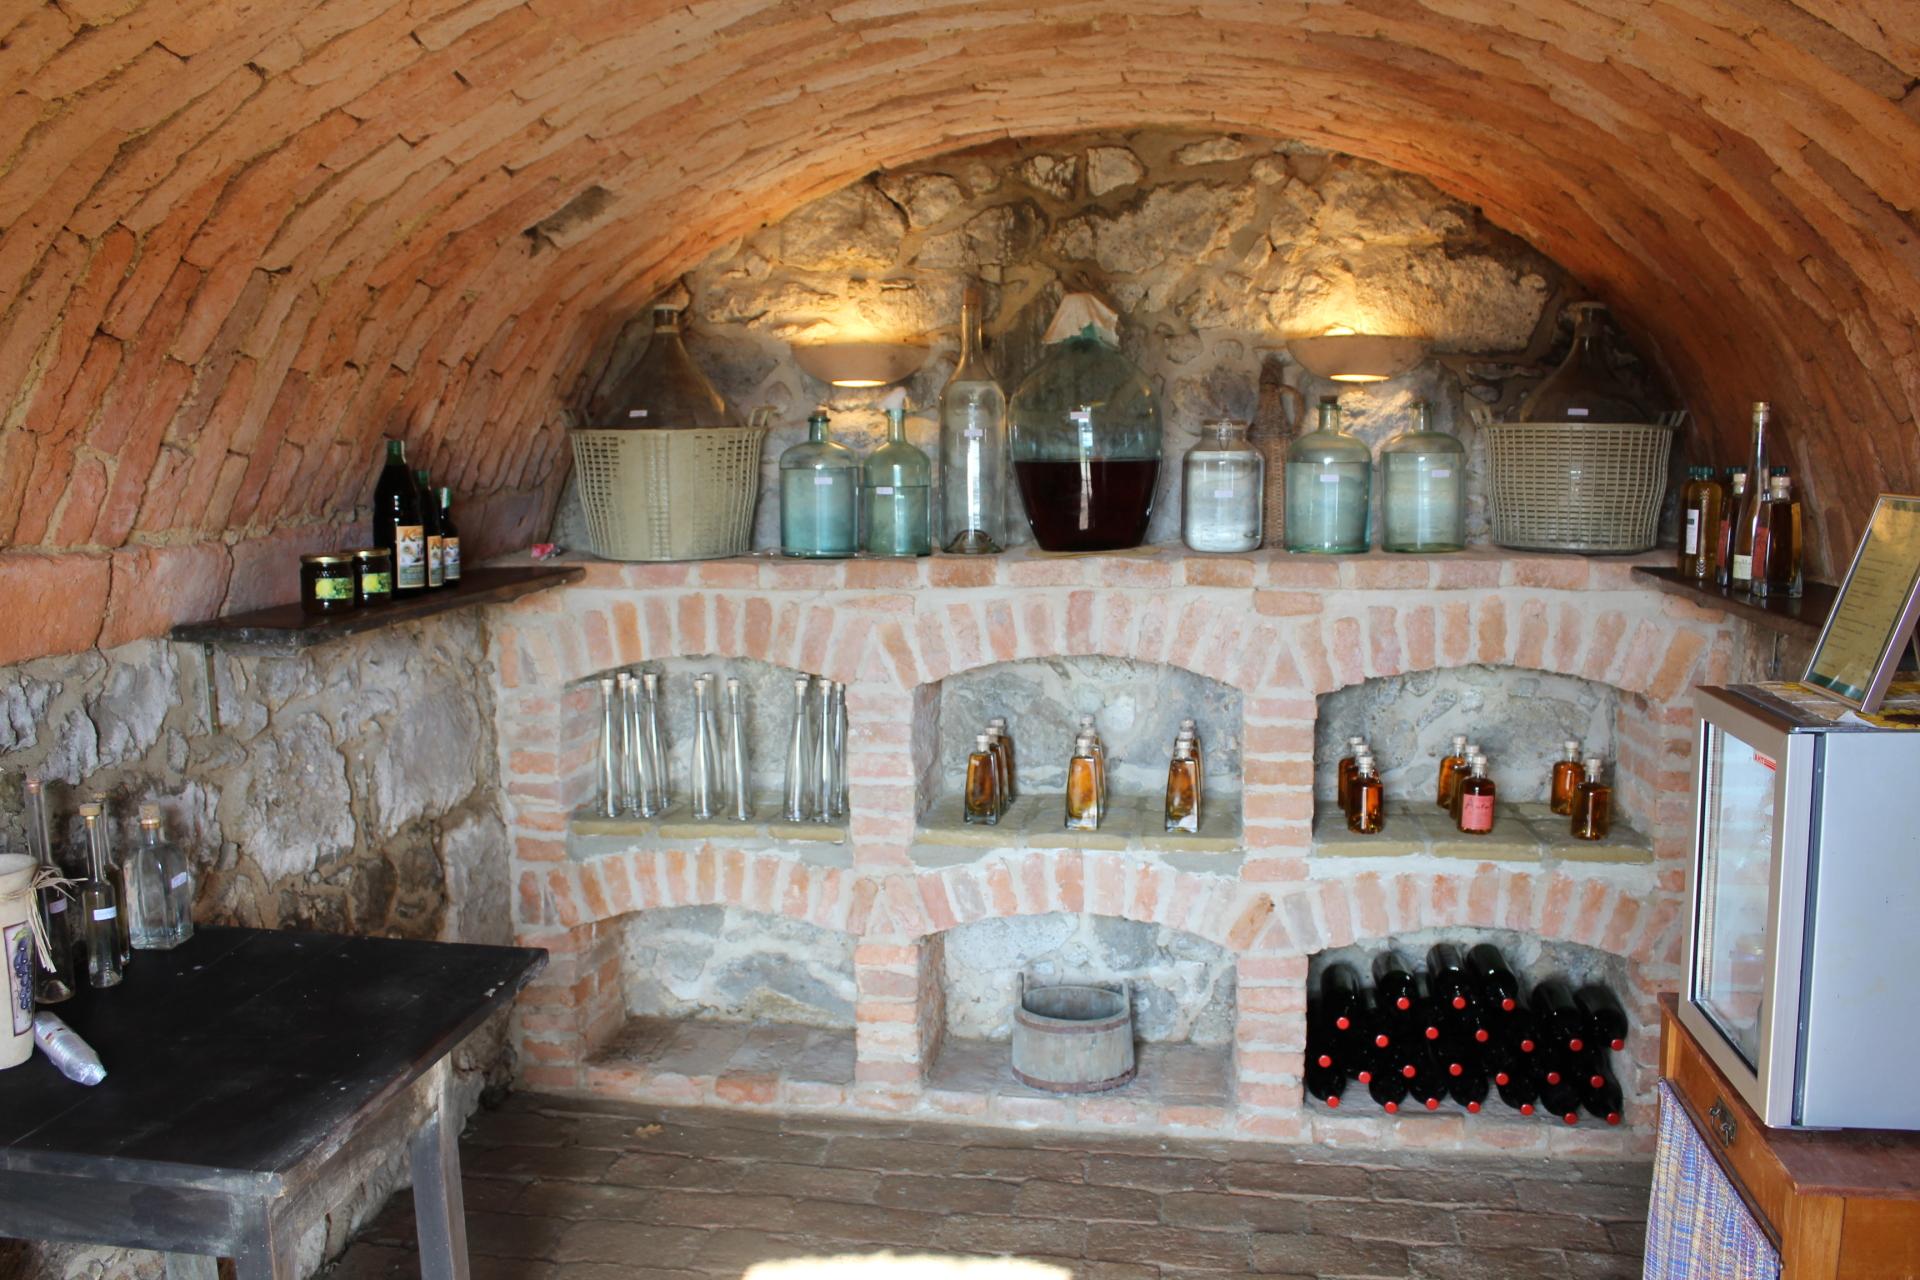 Schnapskeller/Brandy Cellar